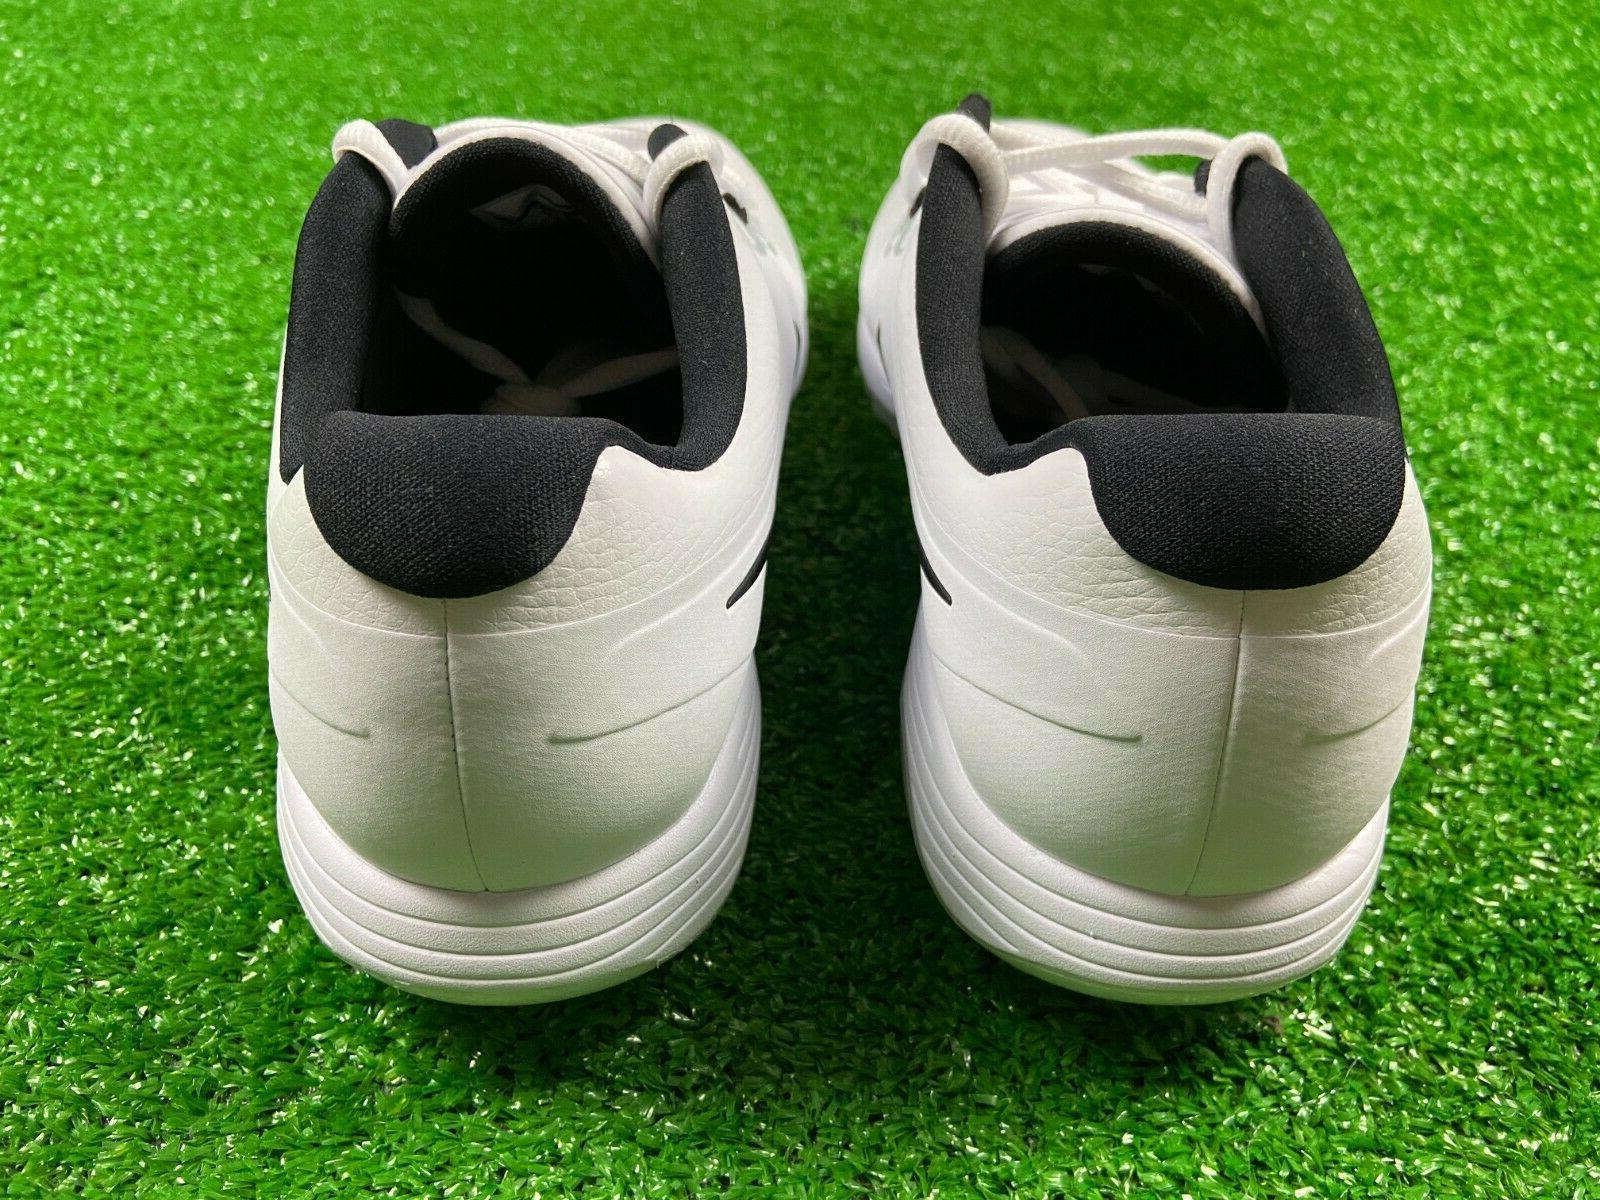 Nike Waterproof Golf Shoes SZ 11